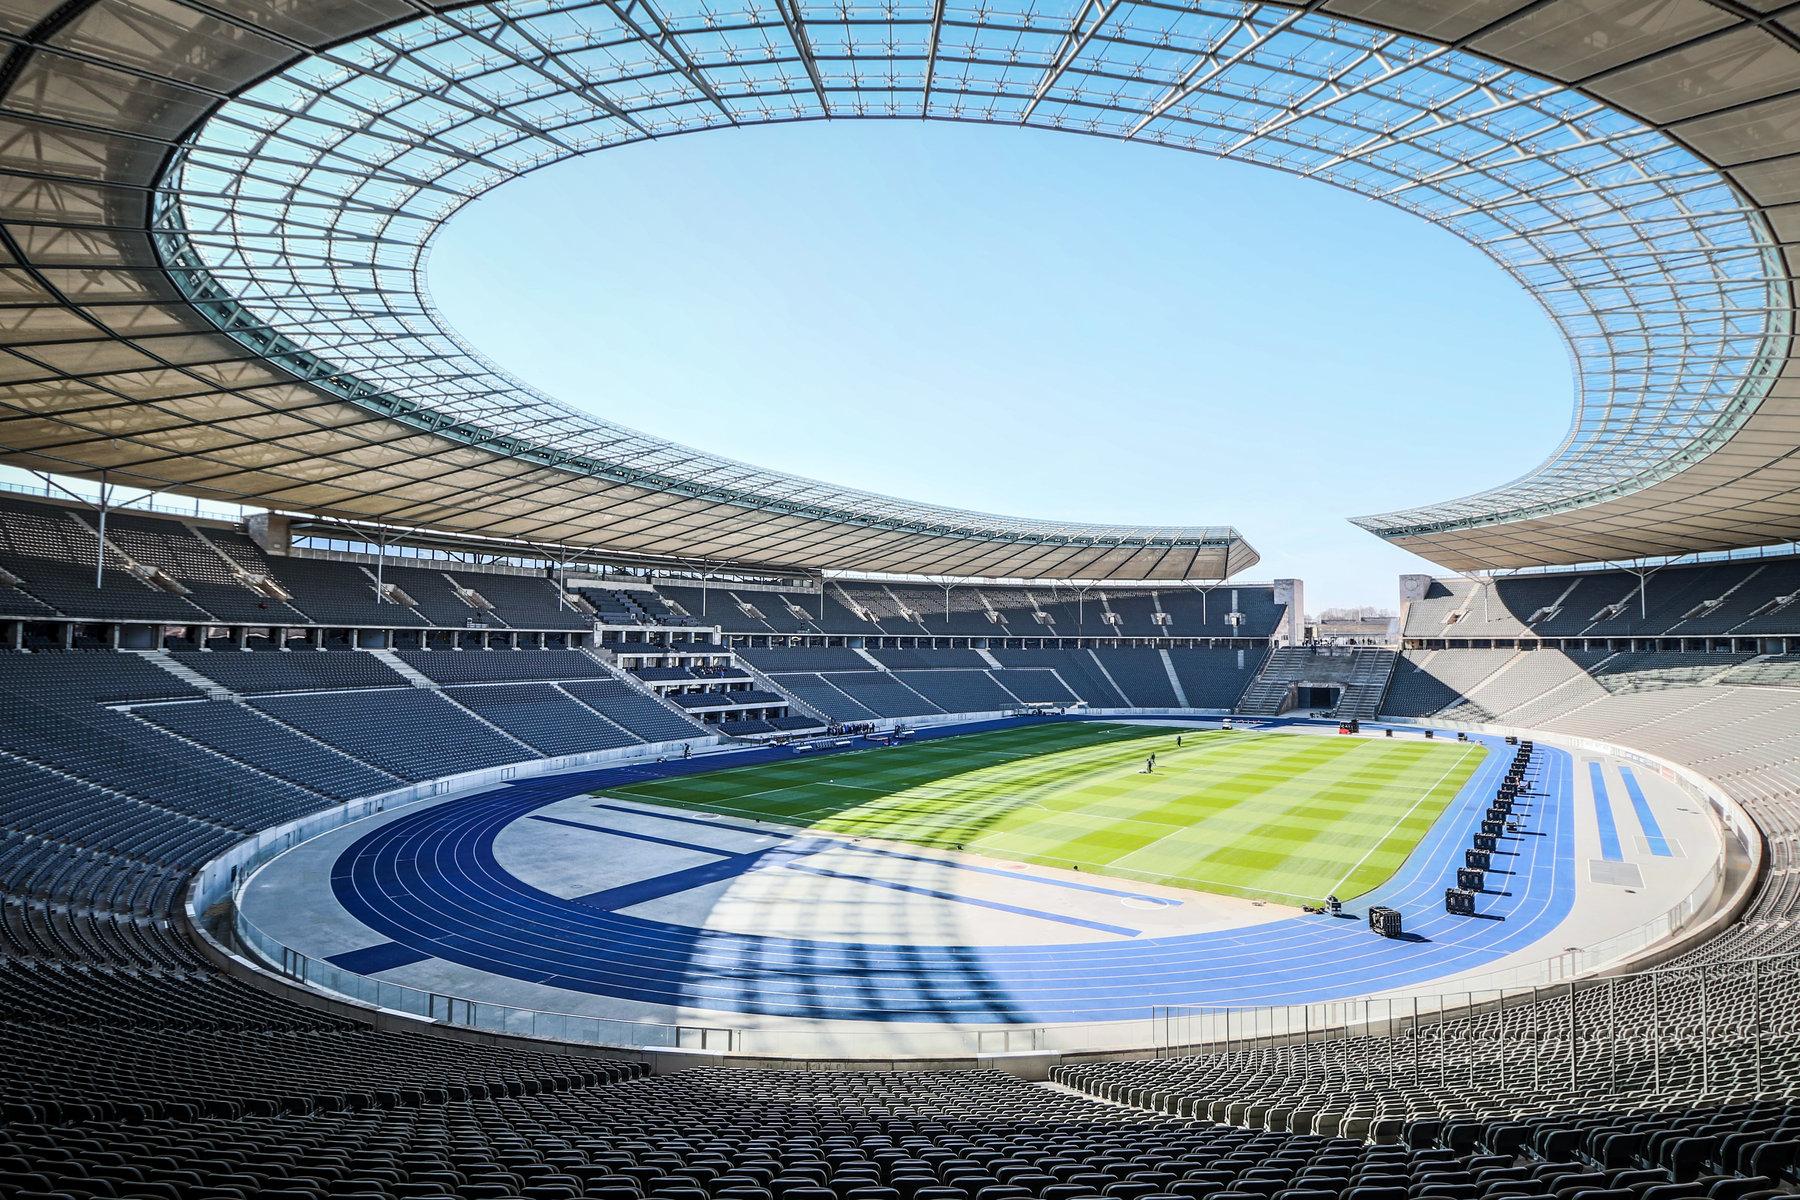 berlin_olympiastadion_stadion